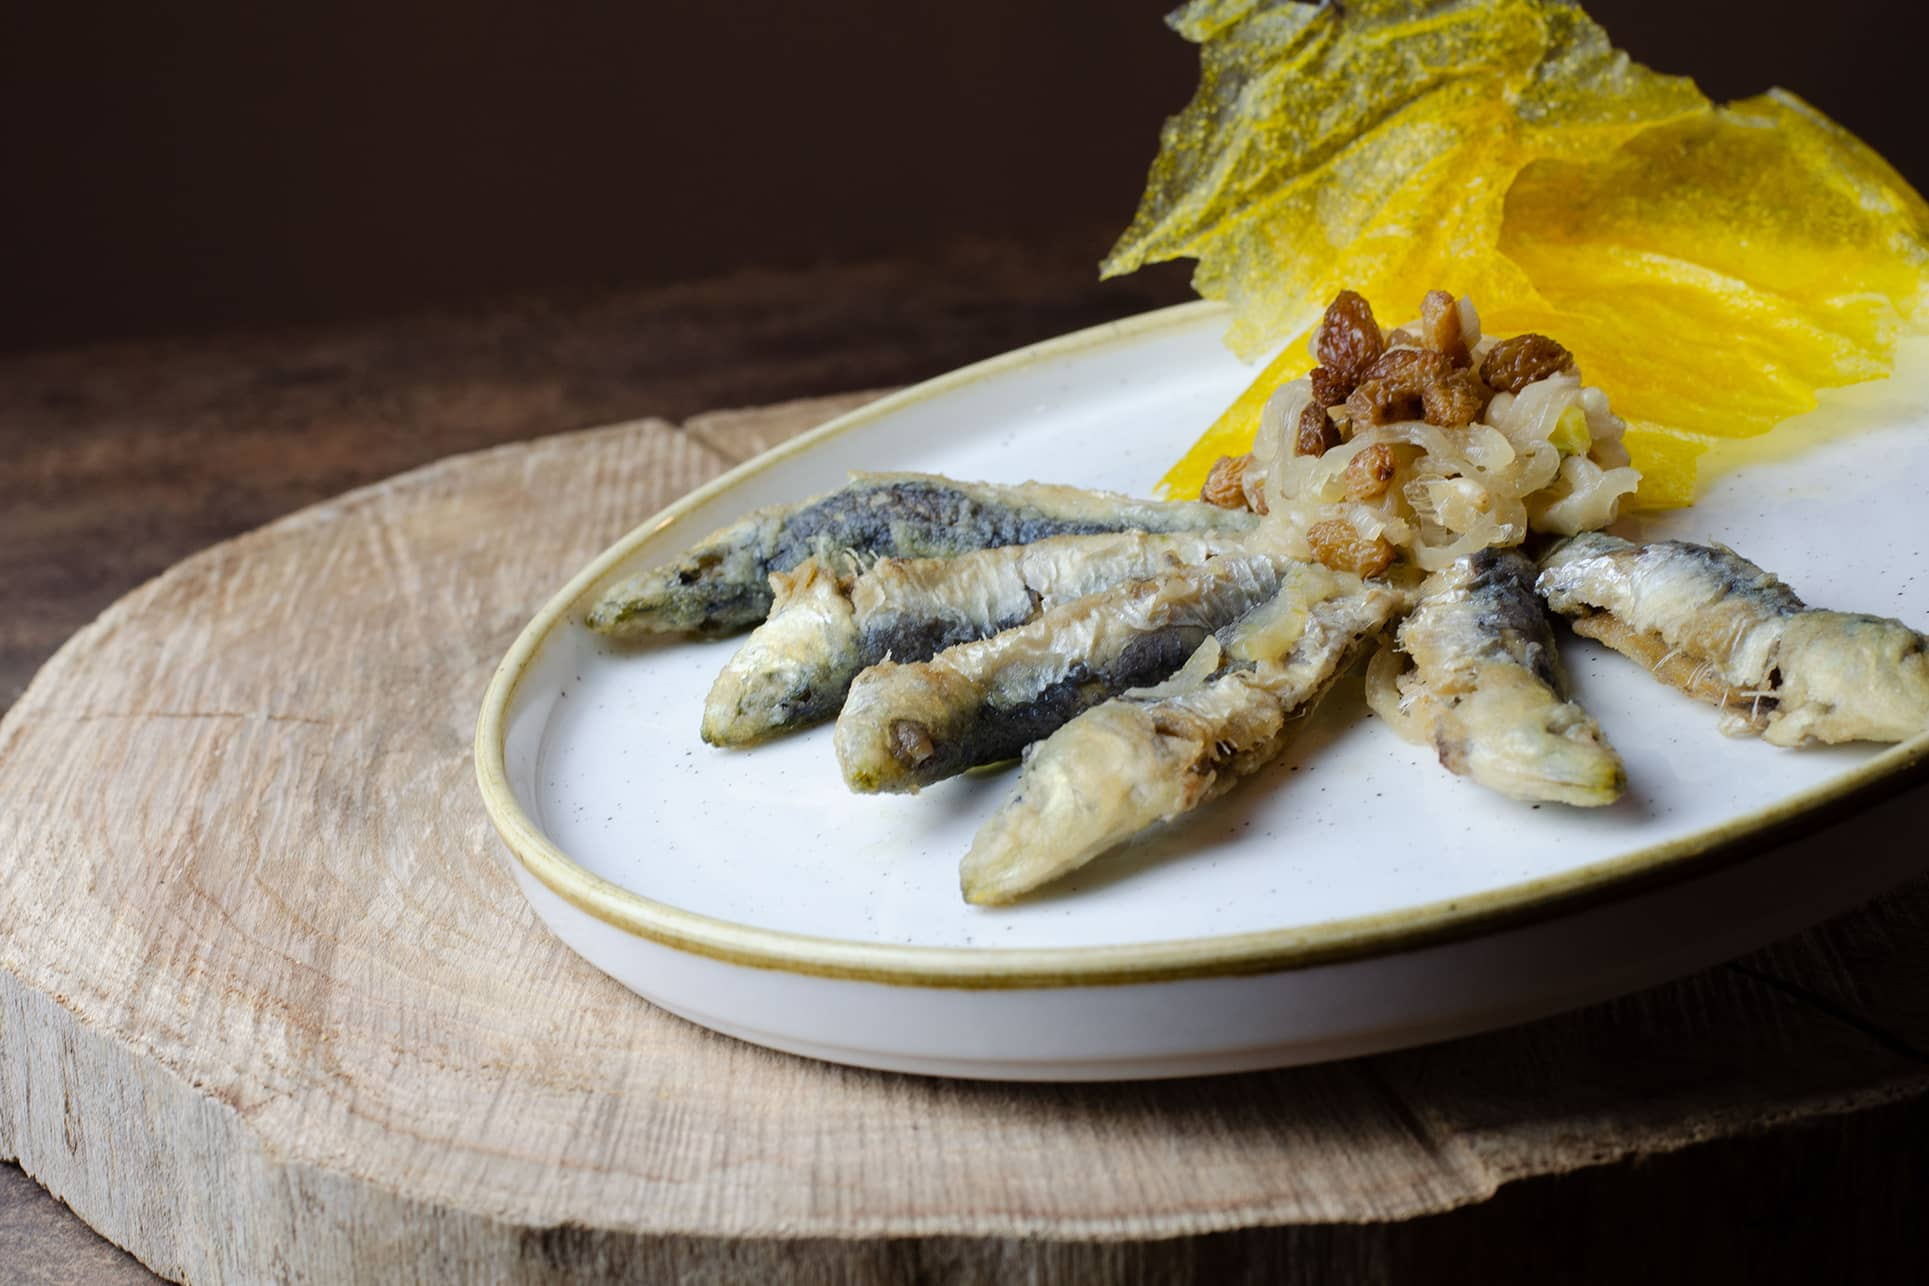 nerodiseppia-pesce-1